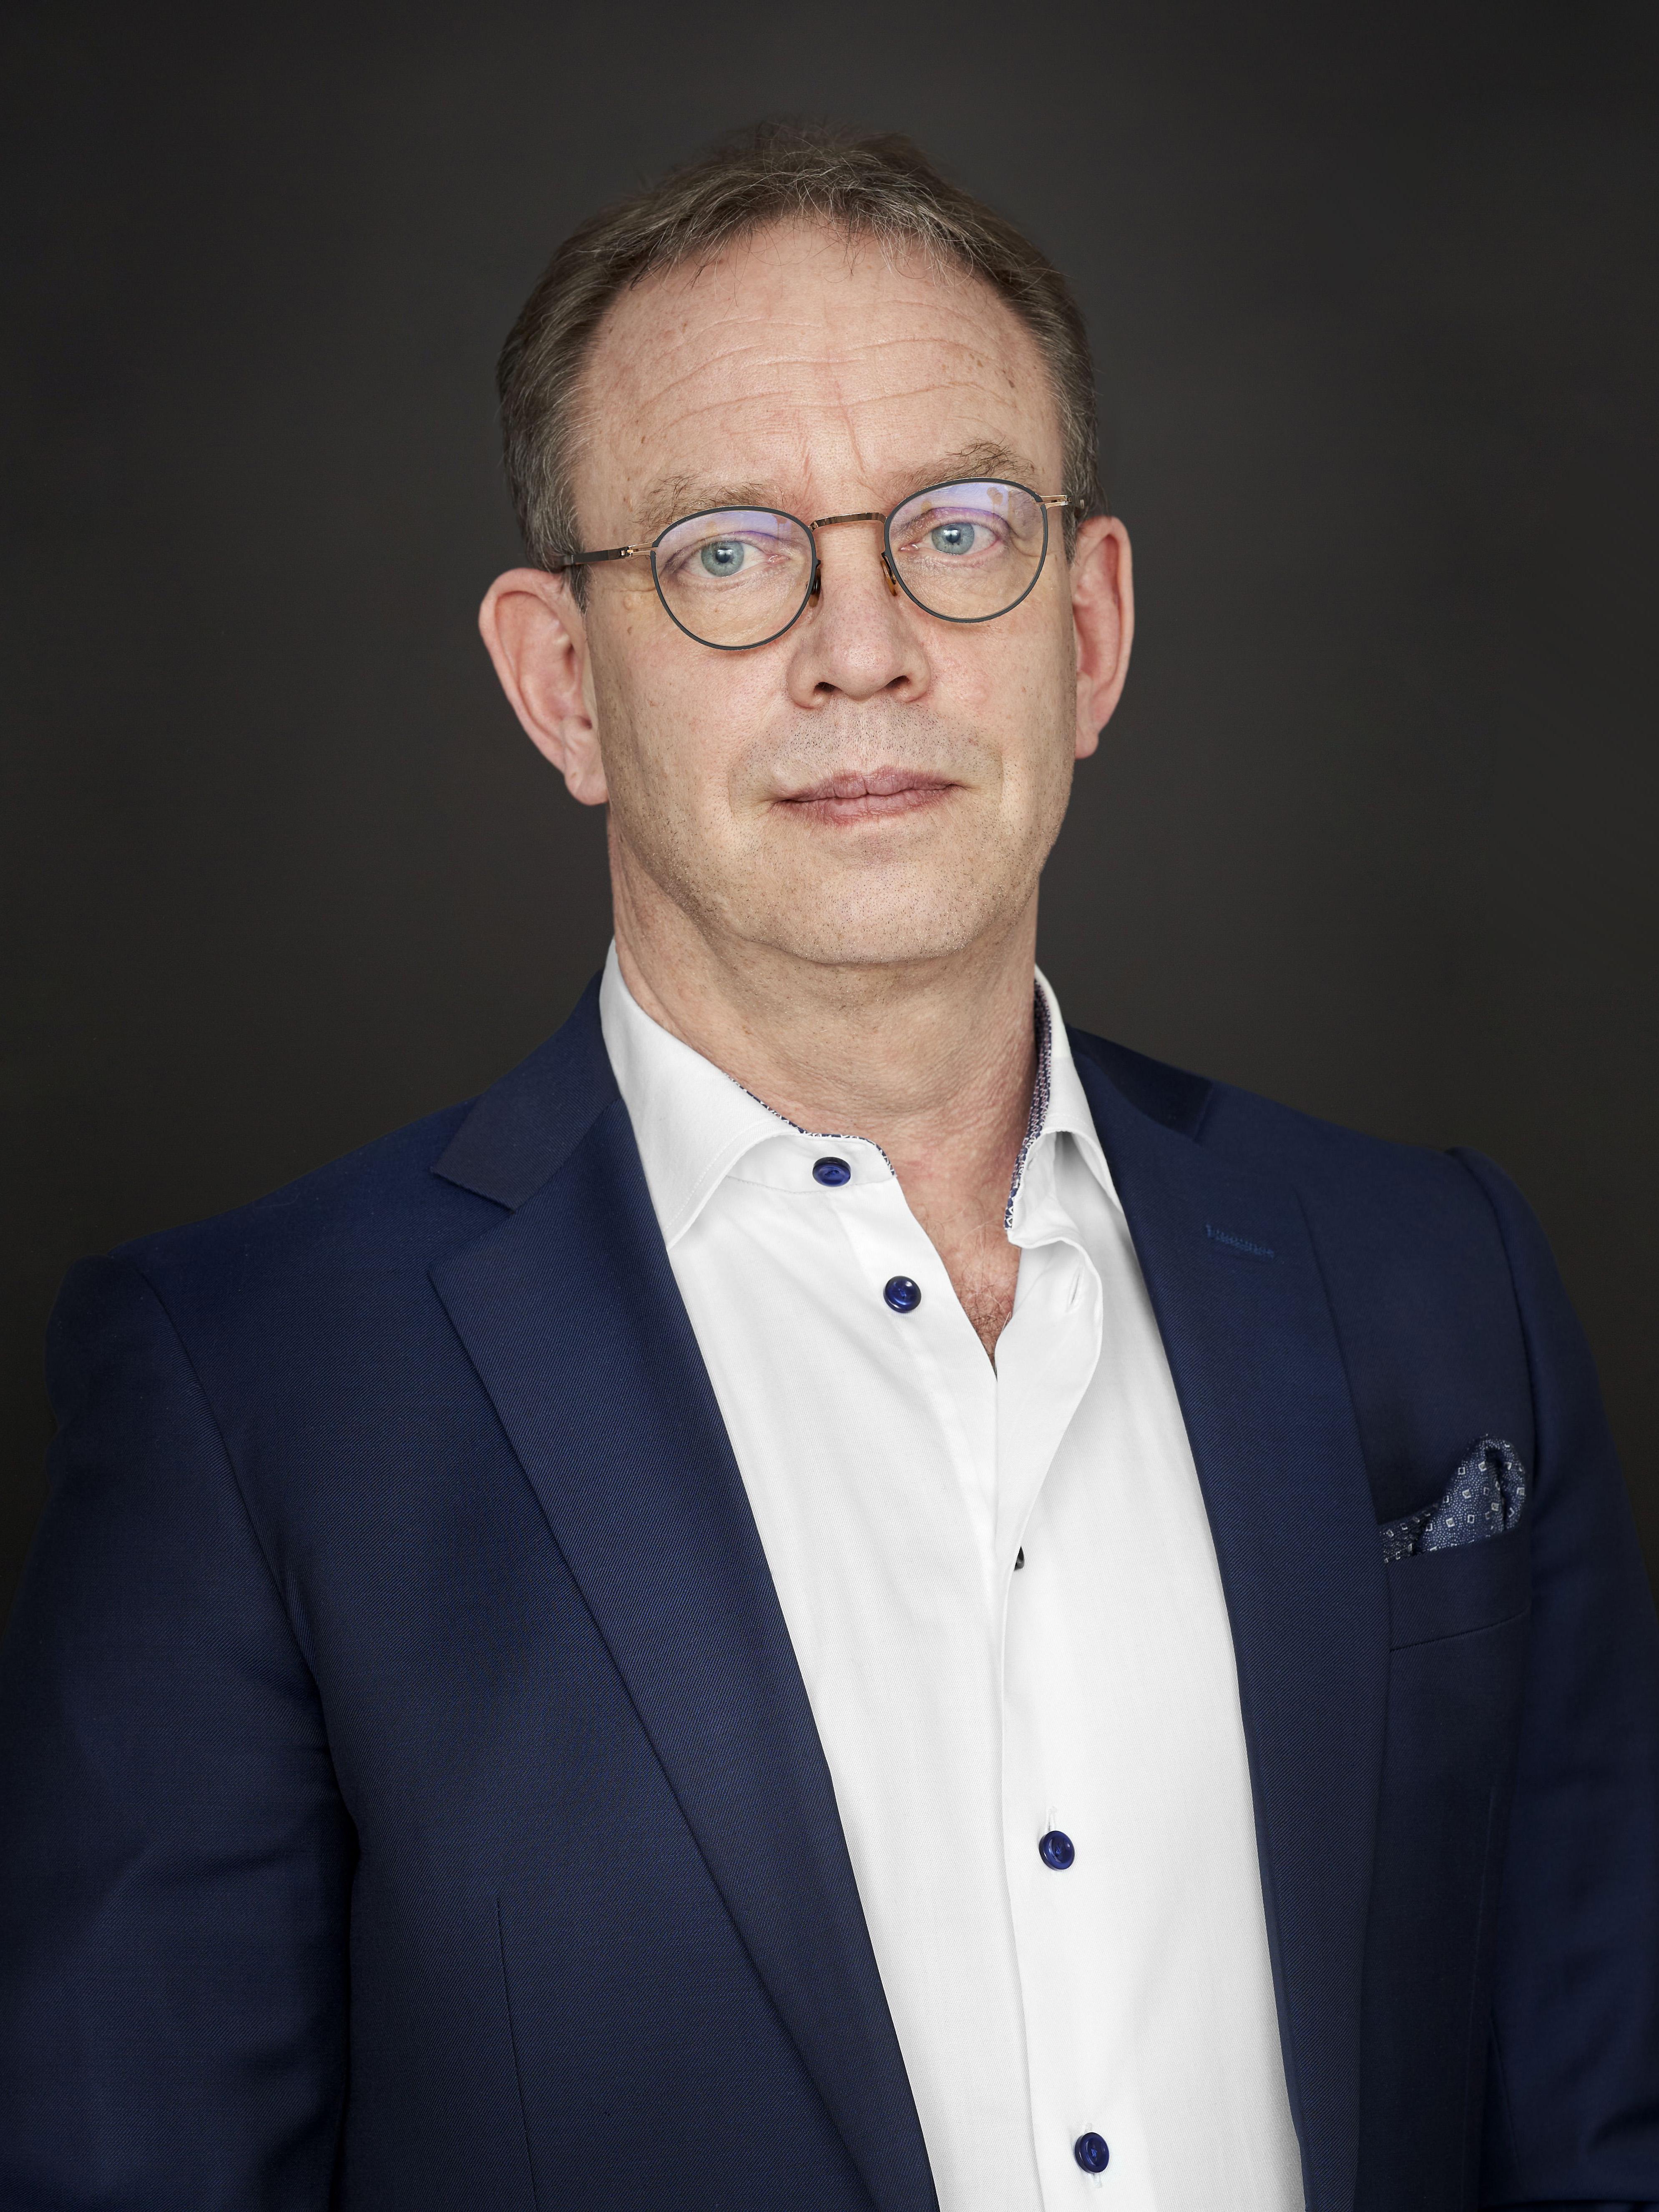 Lars Ydreskog LKAB Hybrit Board